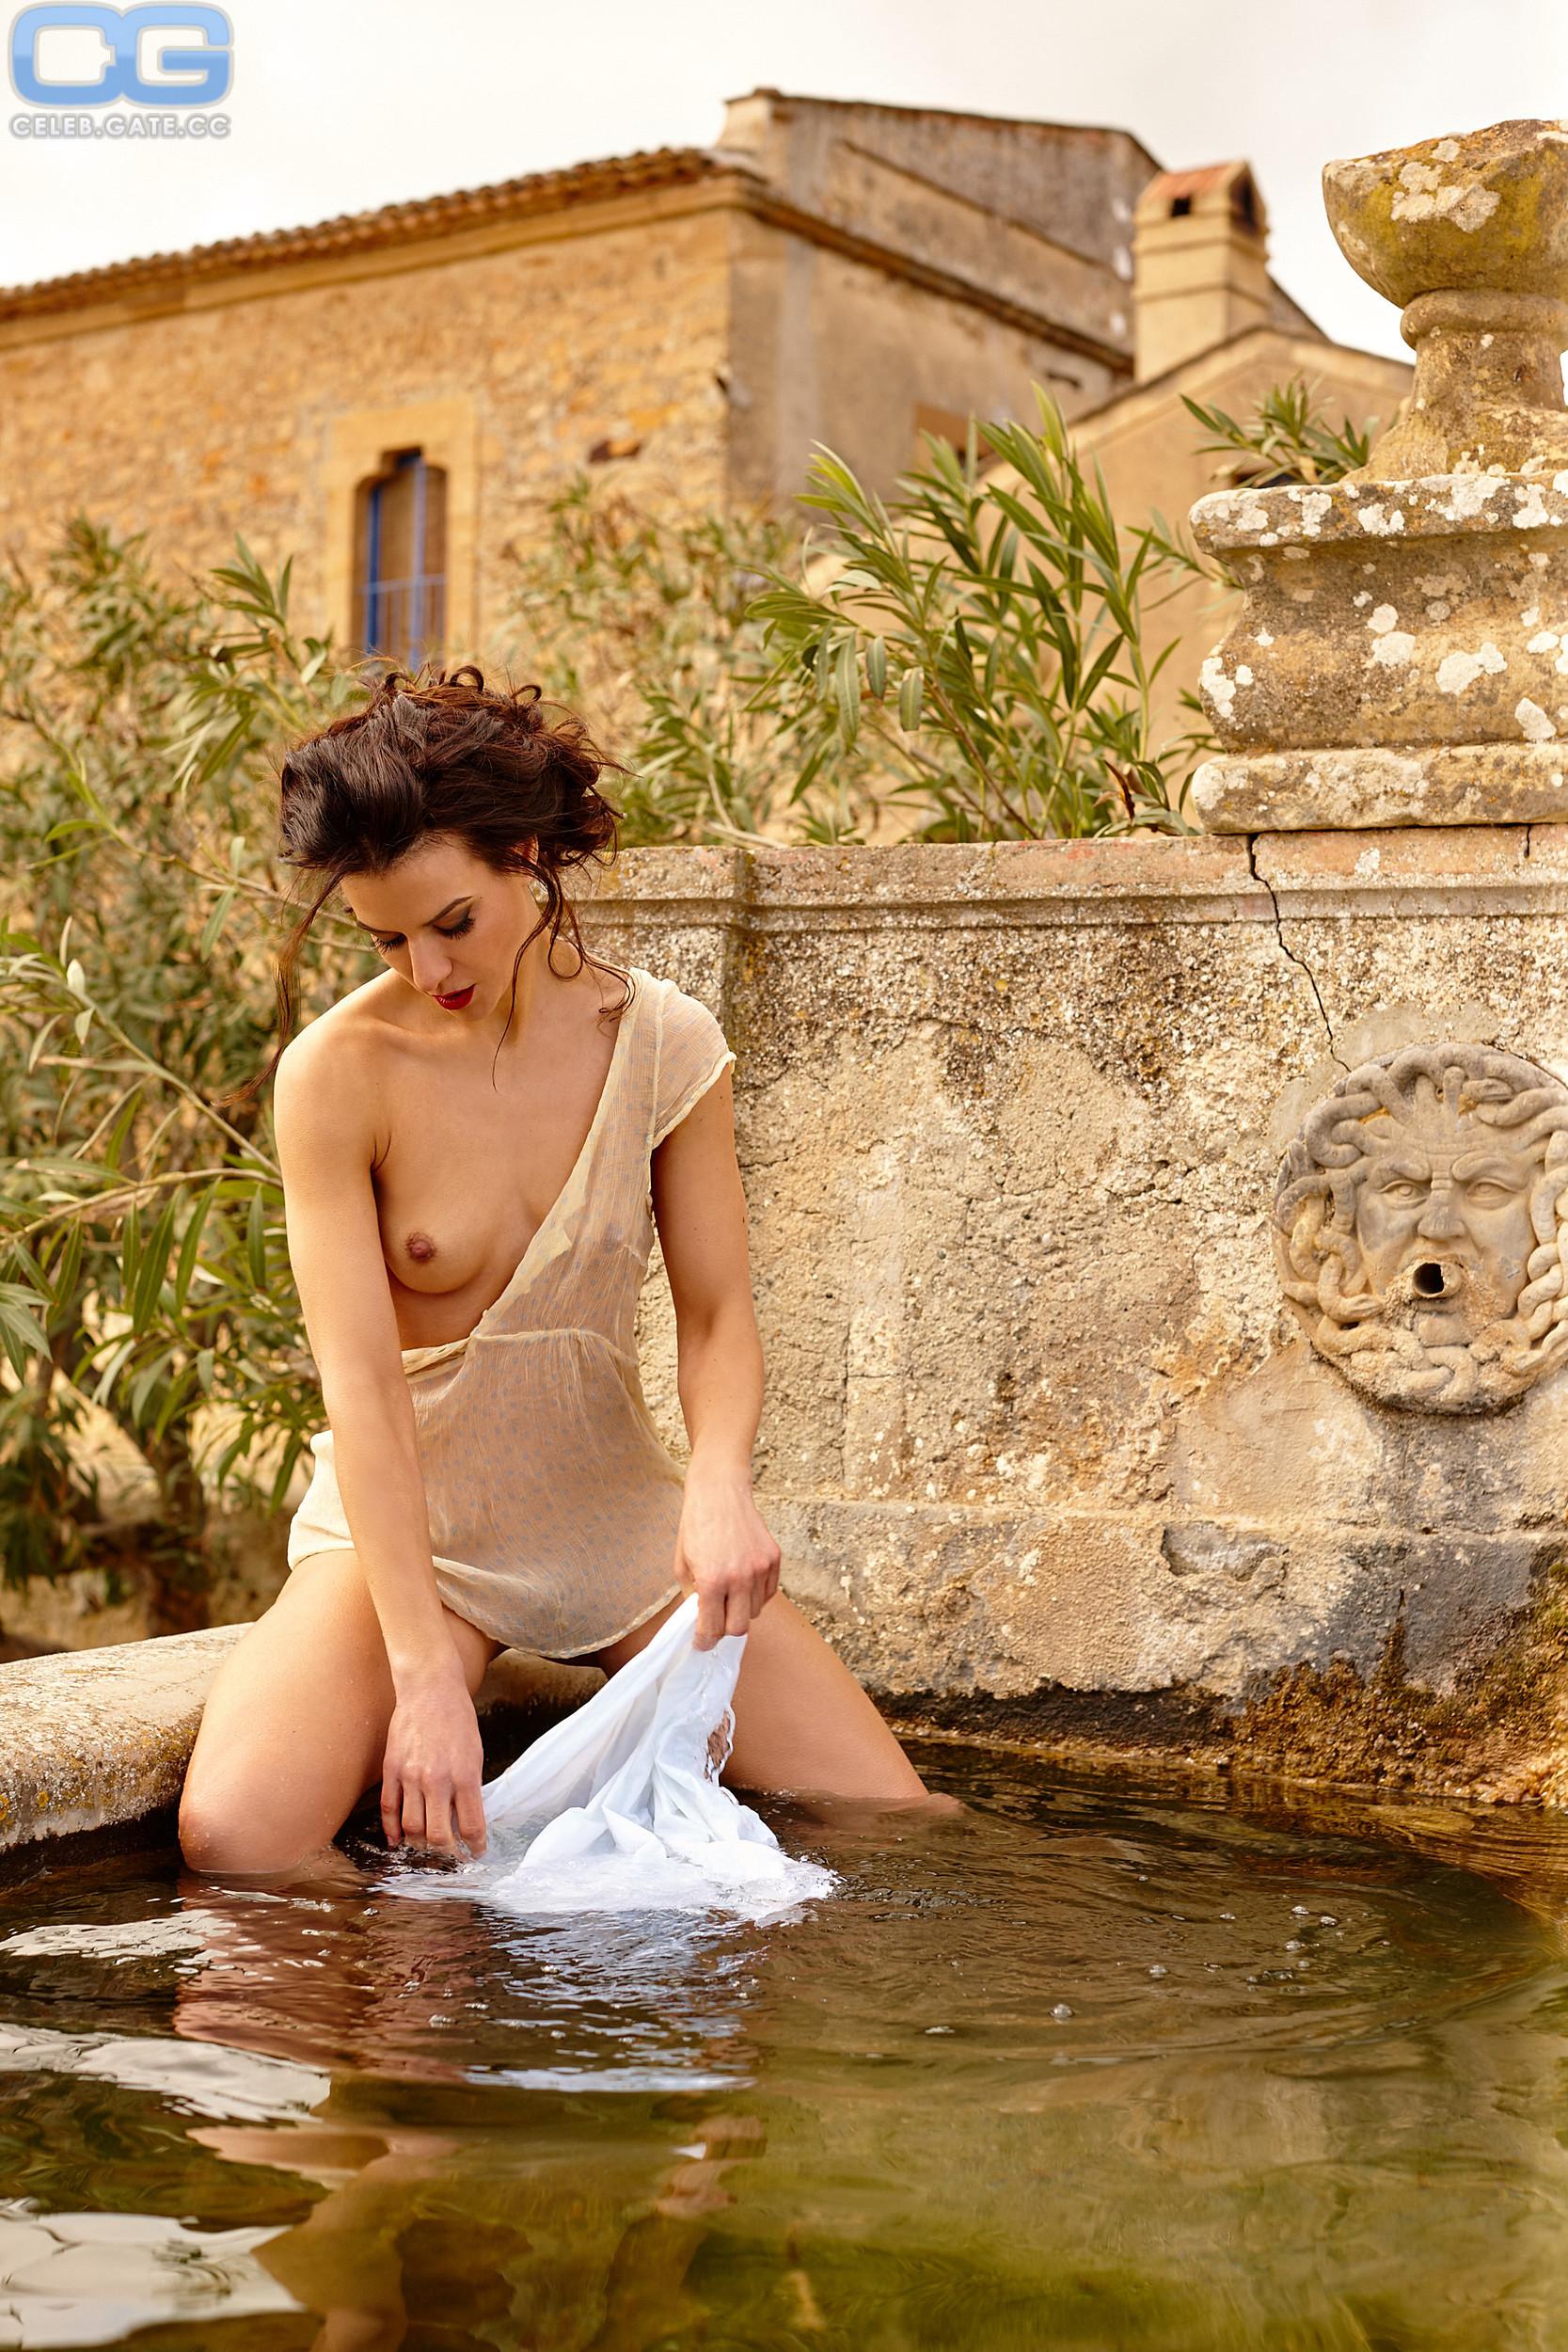 Anna-lena nackt